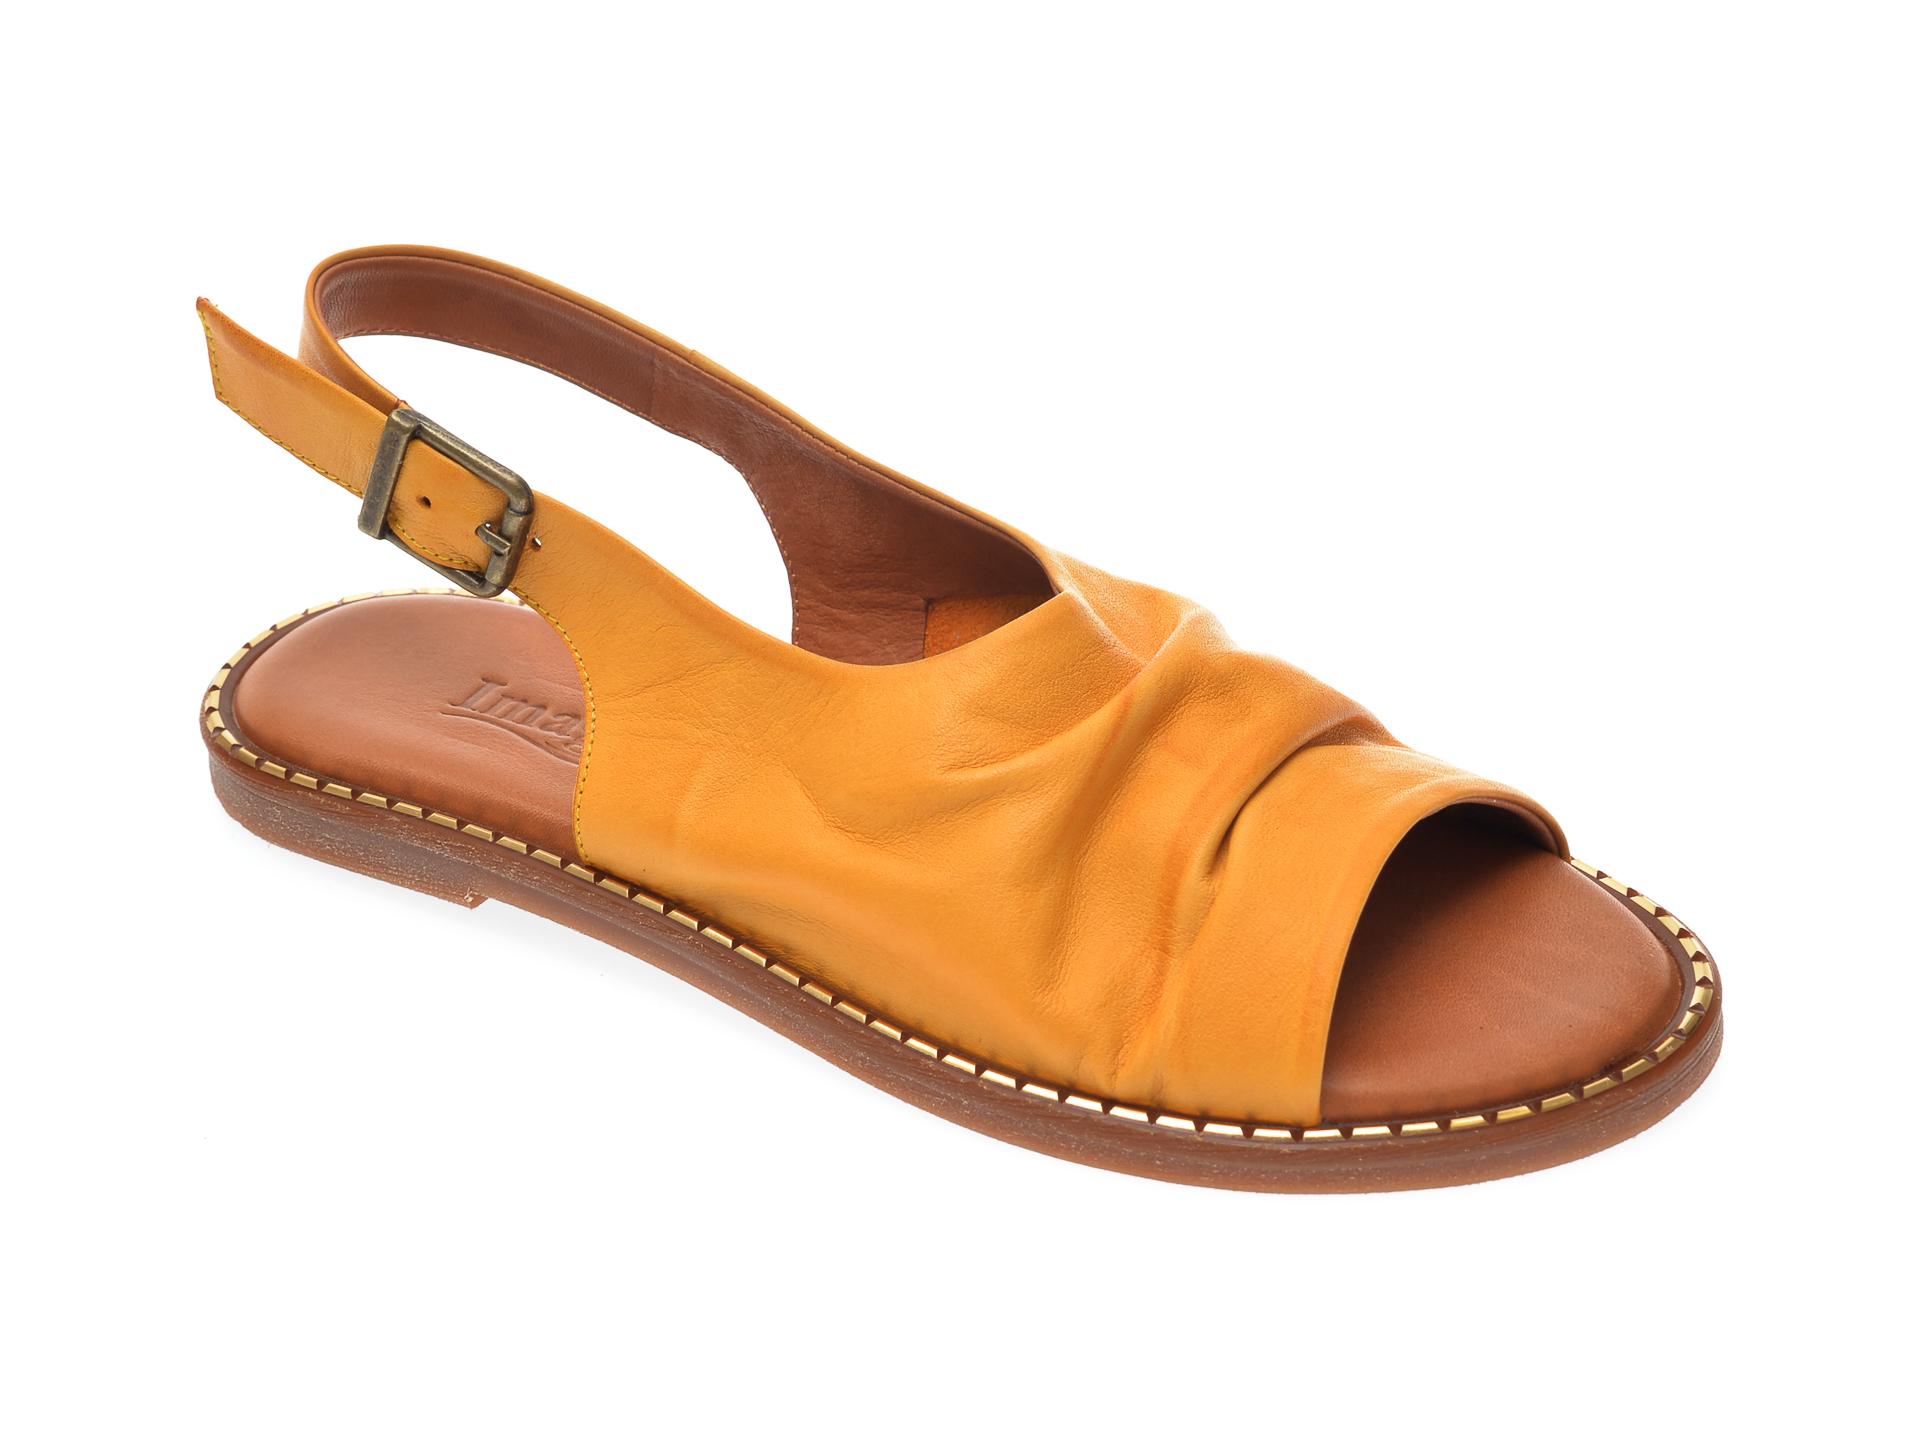 Sandale IMAGE galbene, 707, din piele naturala imagine otter.ro 2021